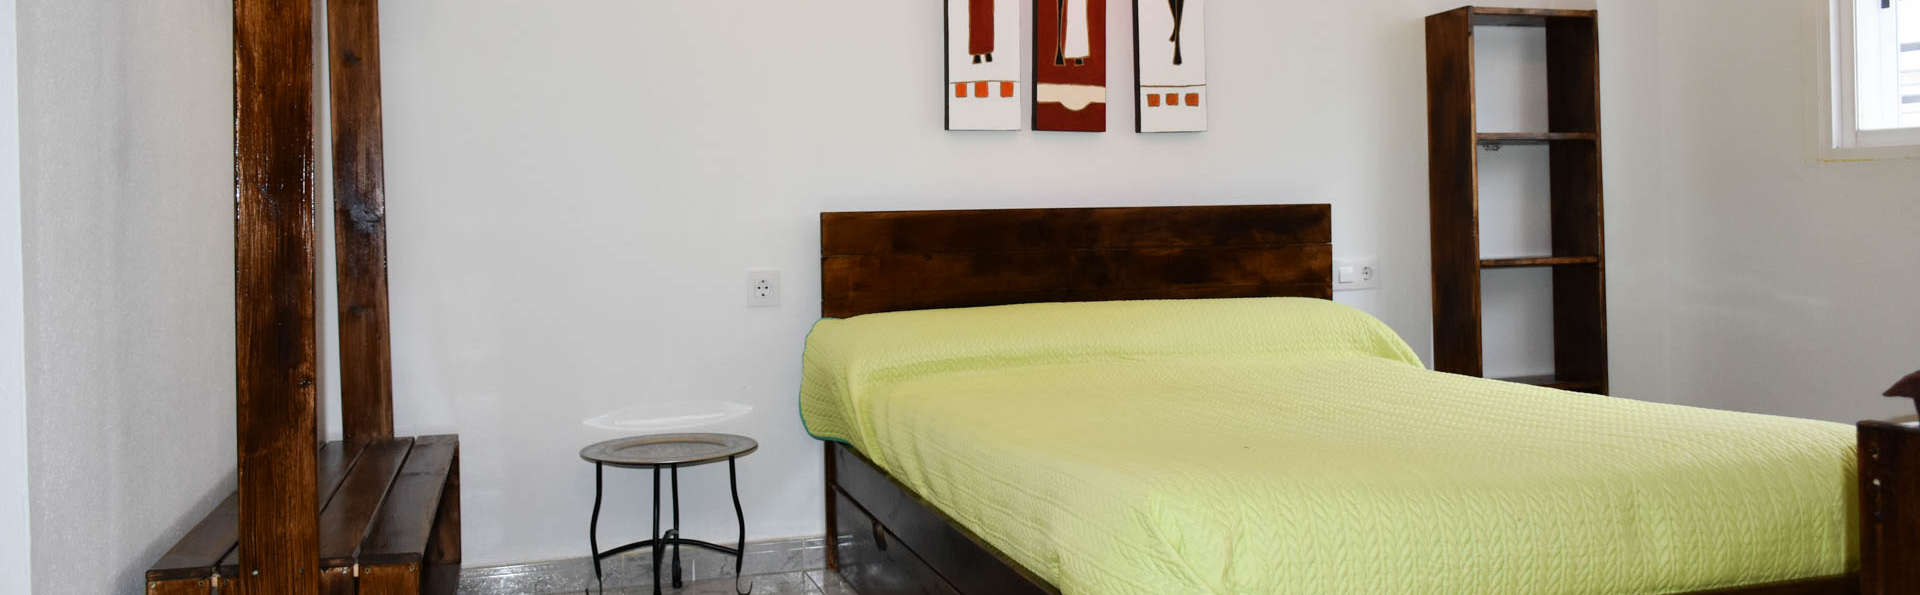 Apartamentos Barbancho - EDIT_APARTMENT0.jpg